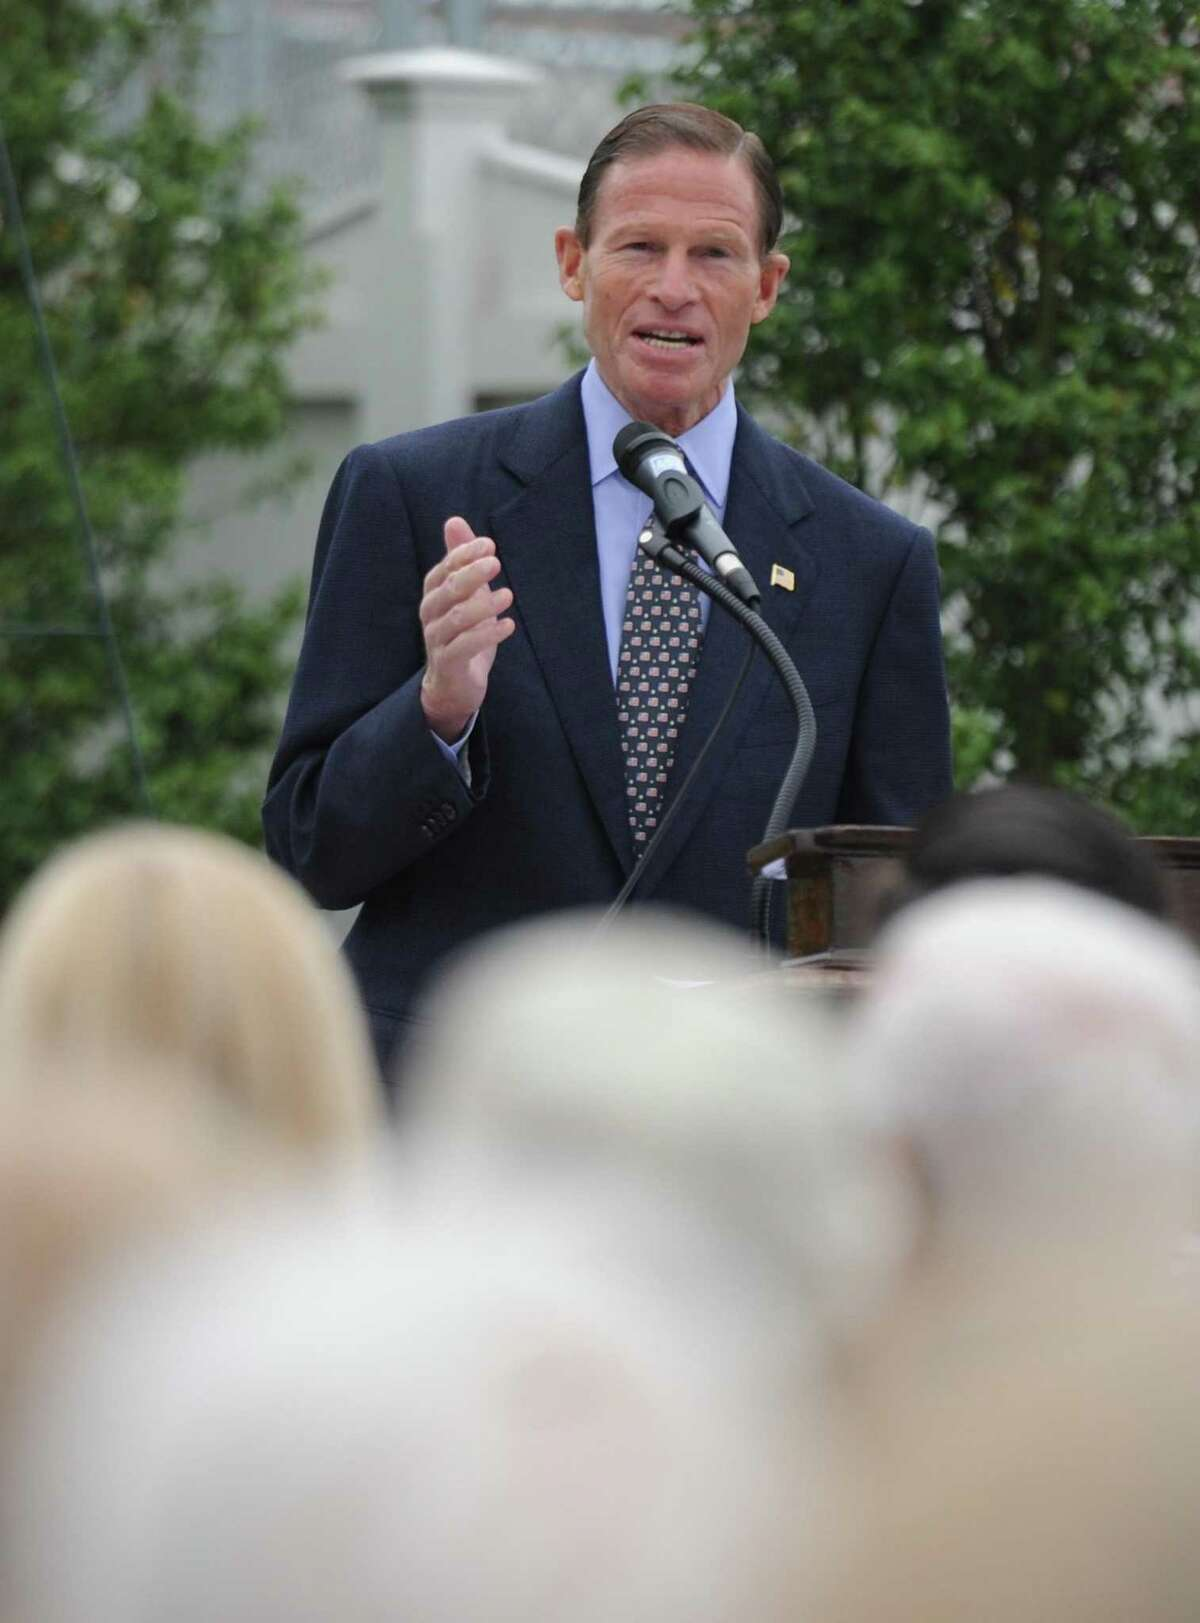 U.S. Sen. Richard Blumenthal in Greenwich in May.